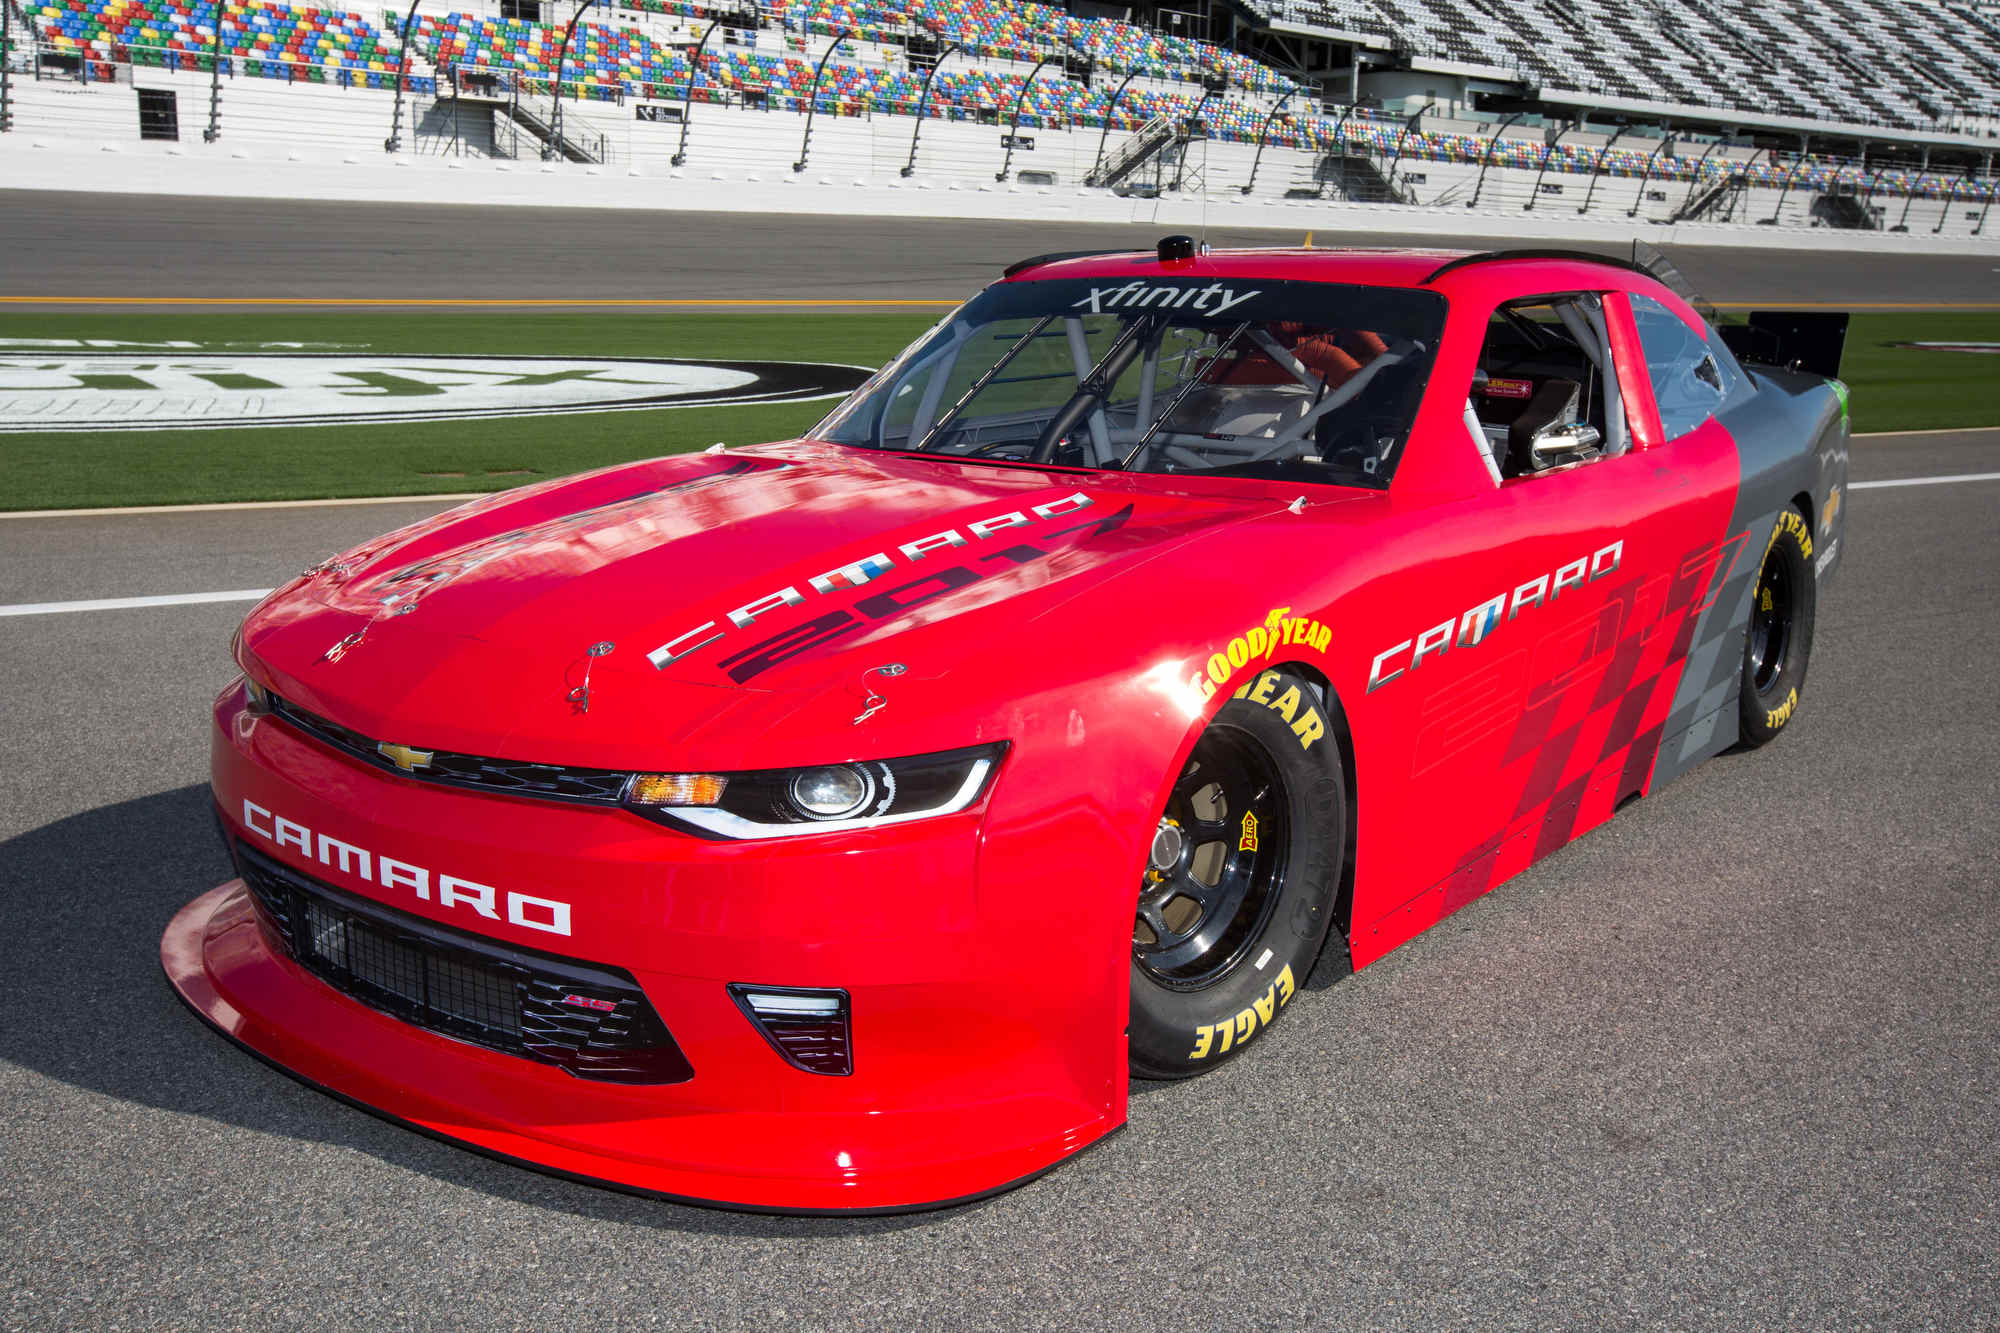 2018 Jeep Grand Cherokee Trackhawk Hellcat >> Sixth-generation Camaro to race in NASCAR Xfinity Series next year